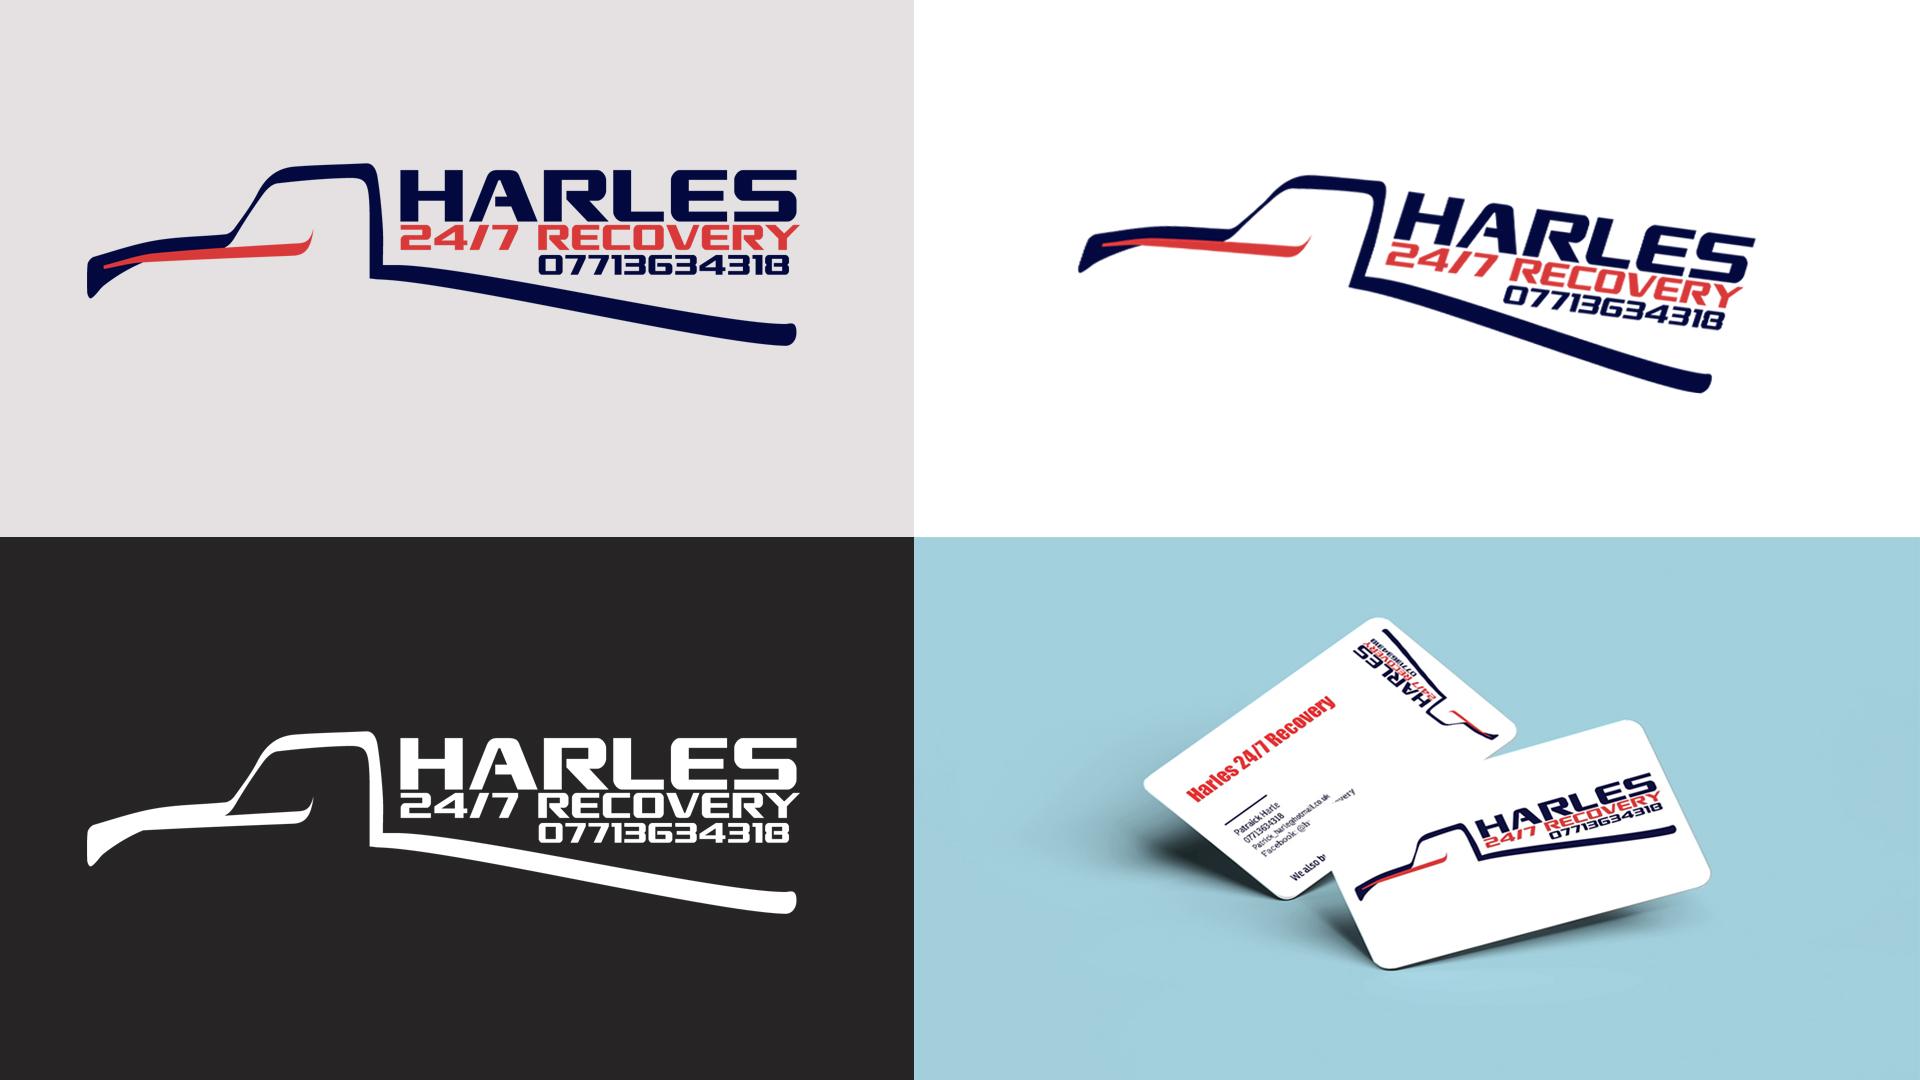 harles products.jpg